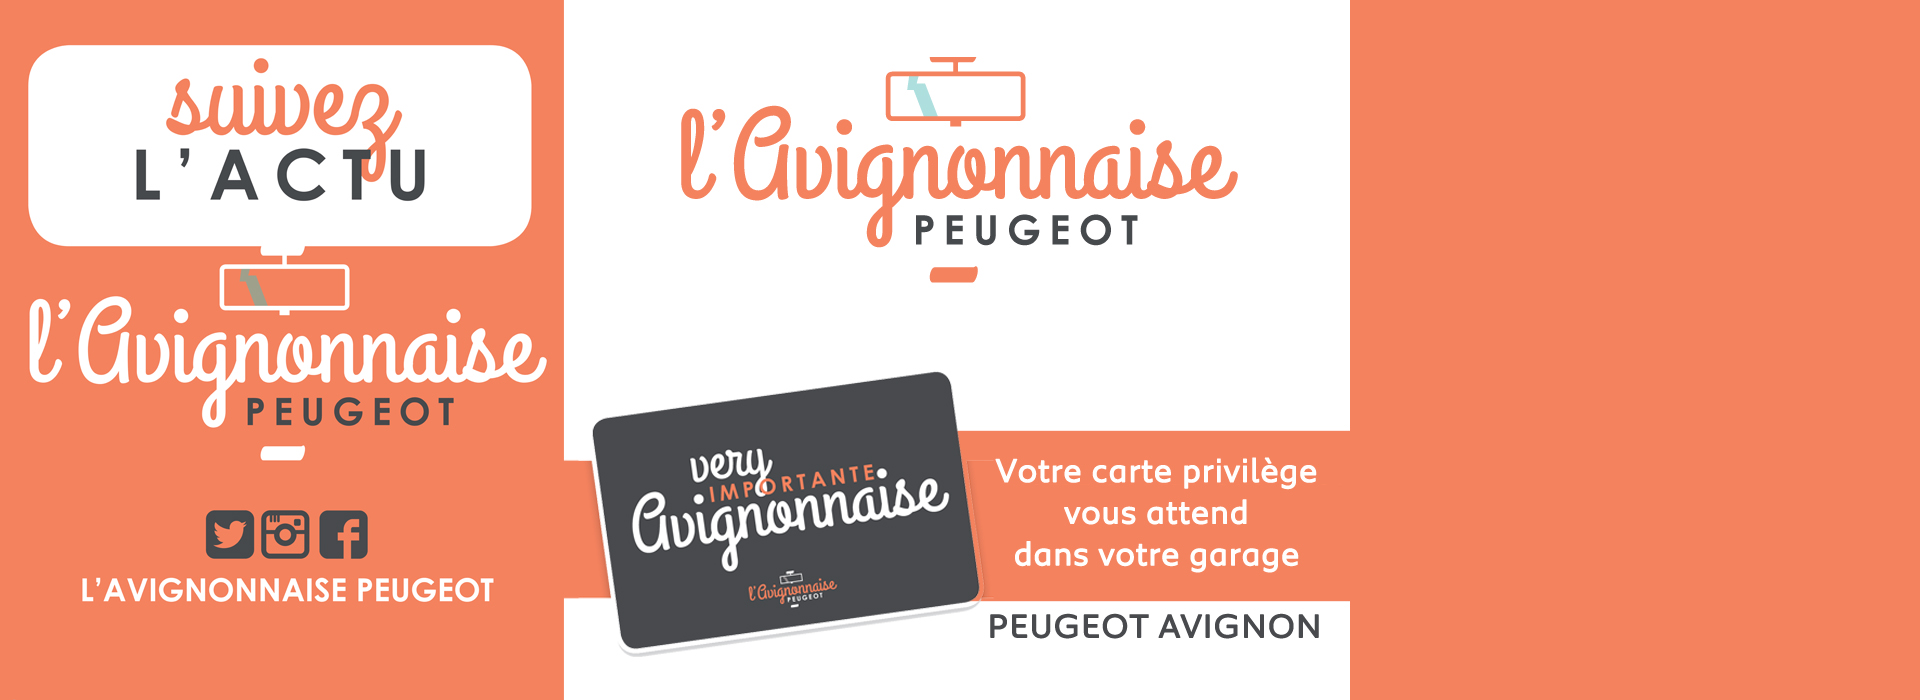 L'Avignonnaise Peugeot